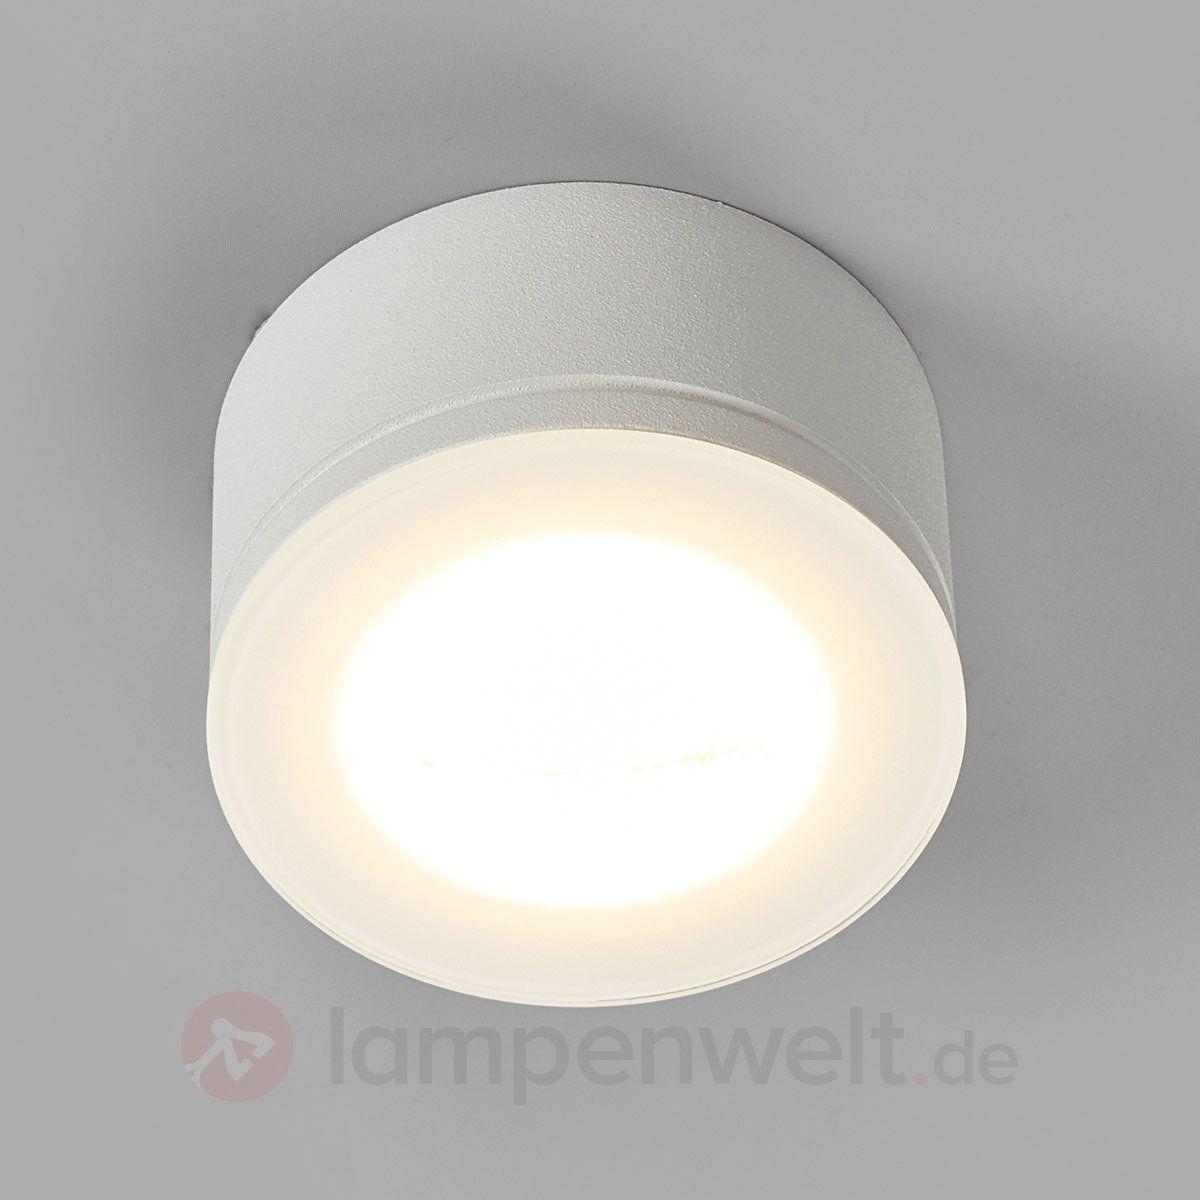 Biala   Runder LED Aufbaustrahler, 10 Cm Ø Sicher U0026amp; Bequem Online  Bestellen